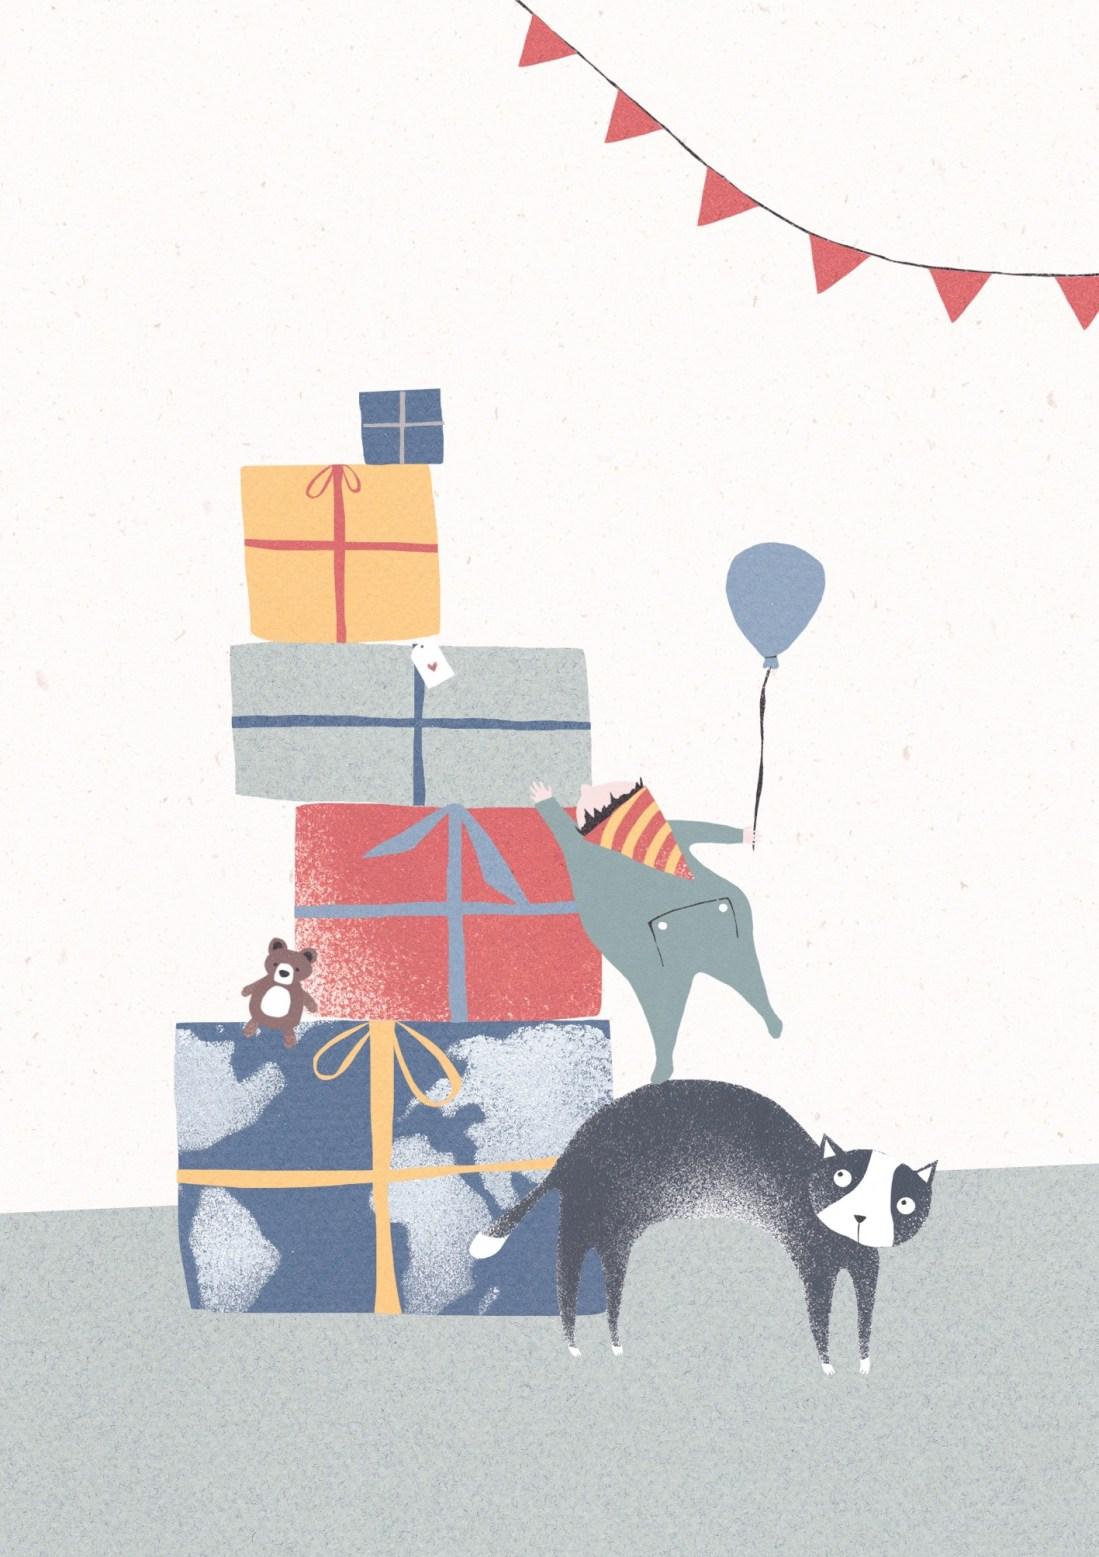 Geburtstagskind-Geschenkeberg-SOS Kinderdörfer